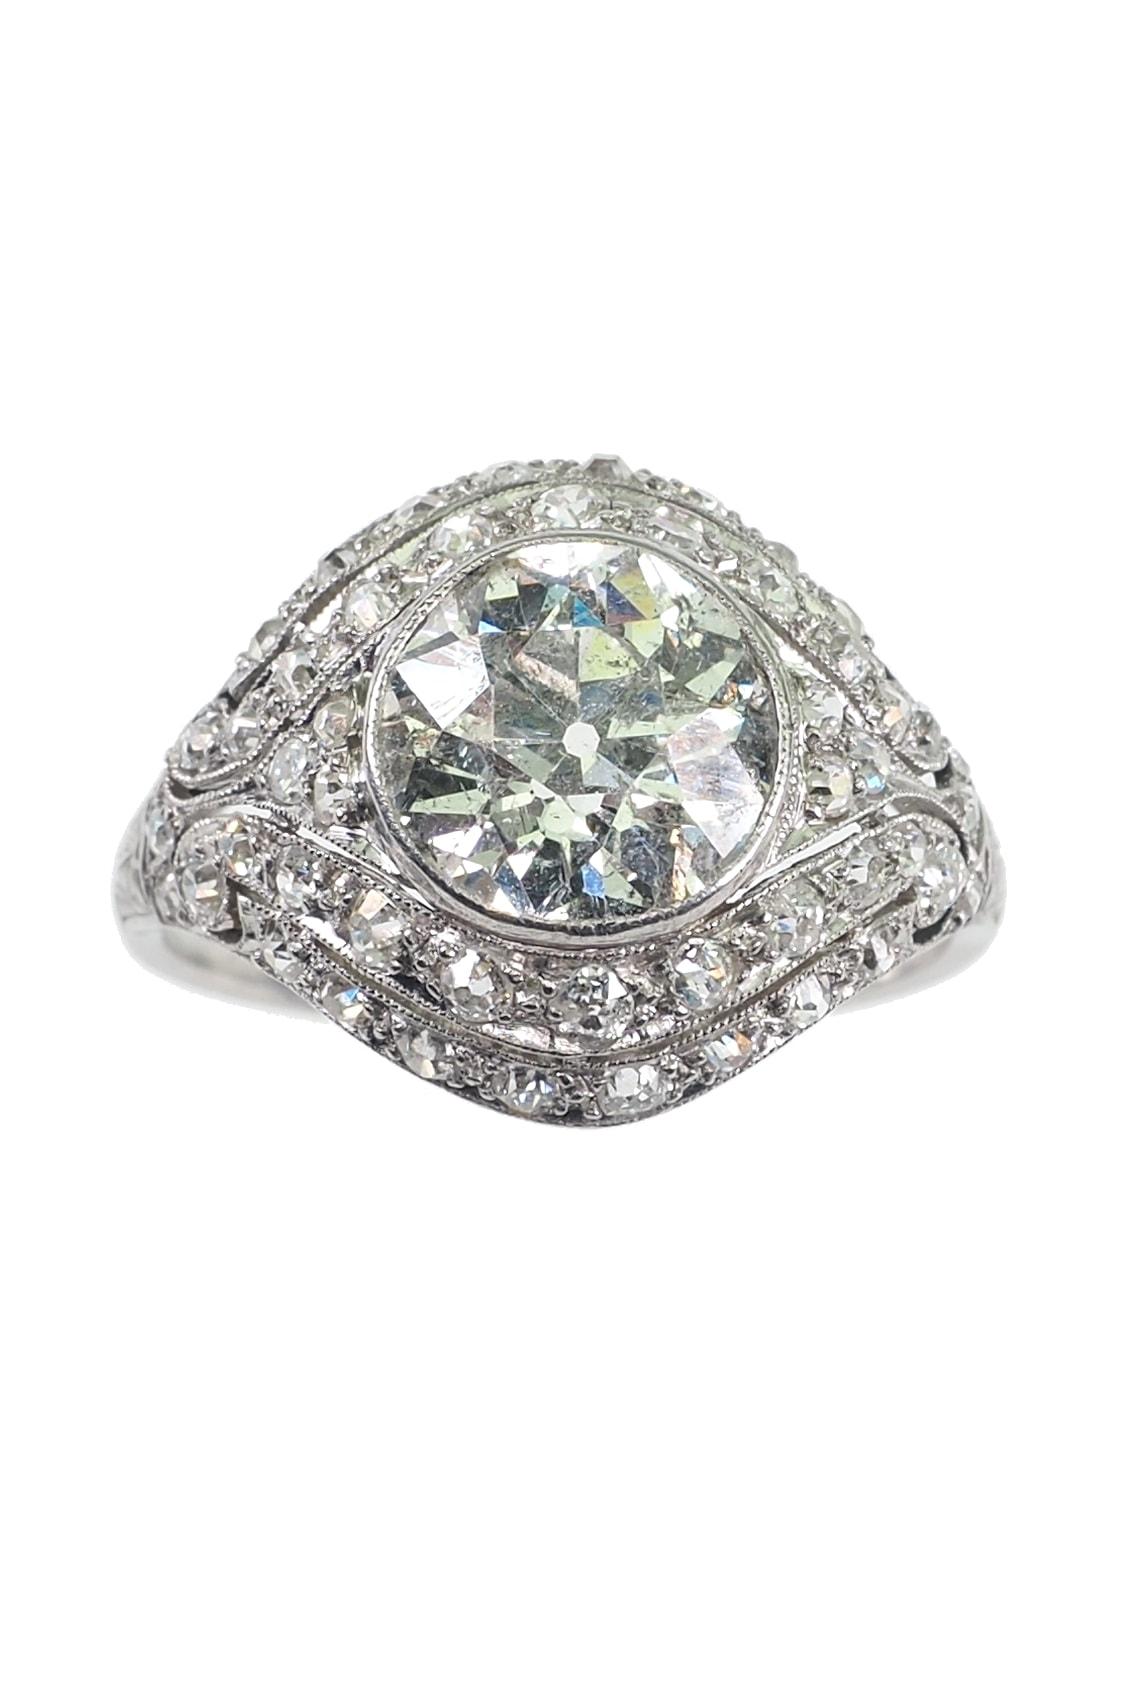 Diamantschmuck-zertifiziert-kaufen-1012